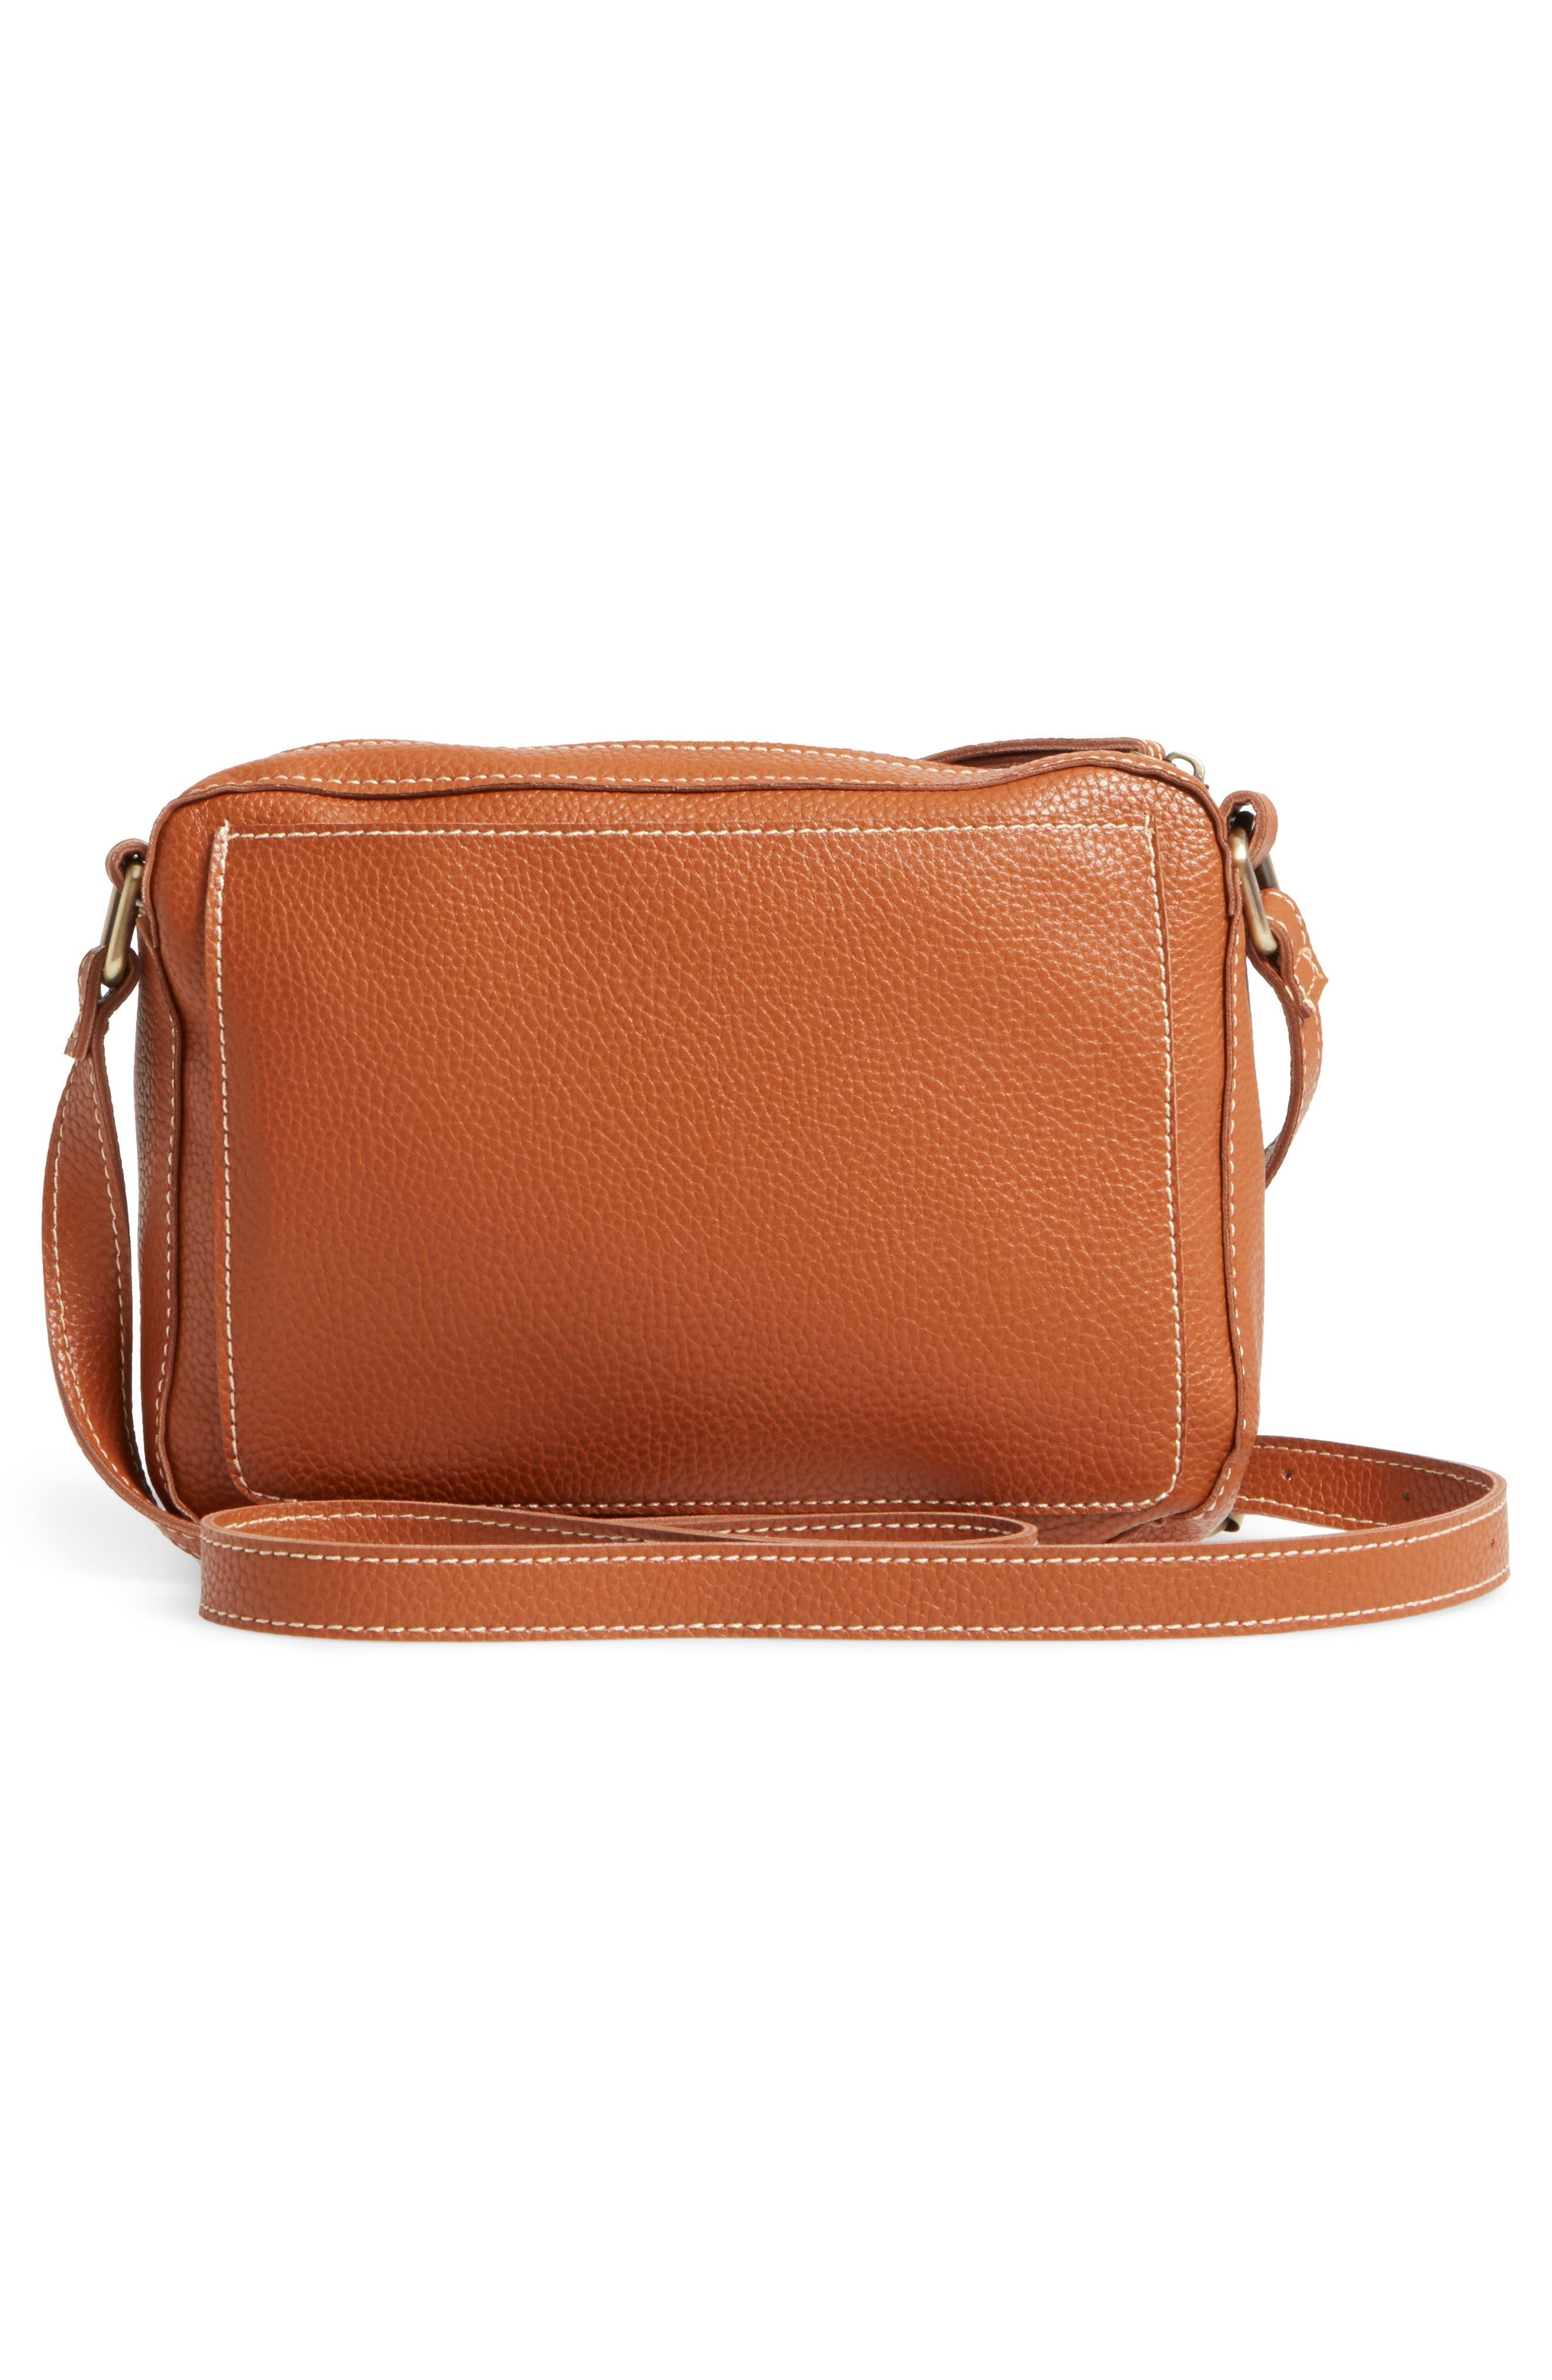 Skylar Faux Leather Crossbody Bag,                             Alternate thumbnail 3, color,